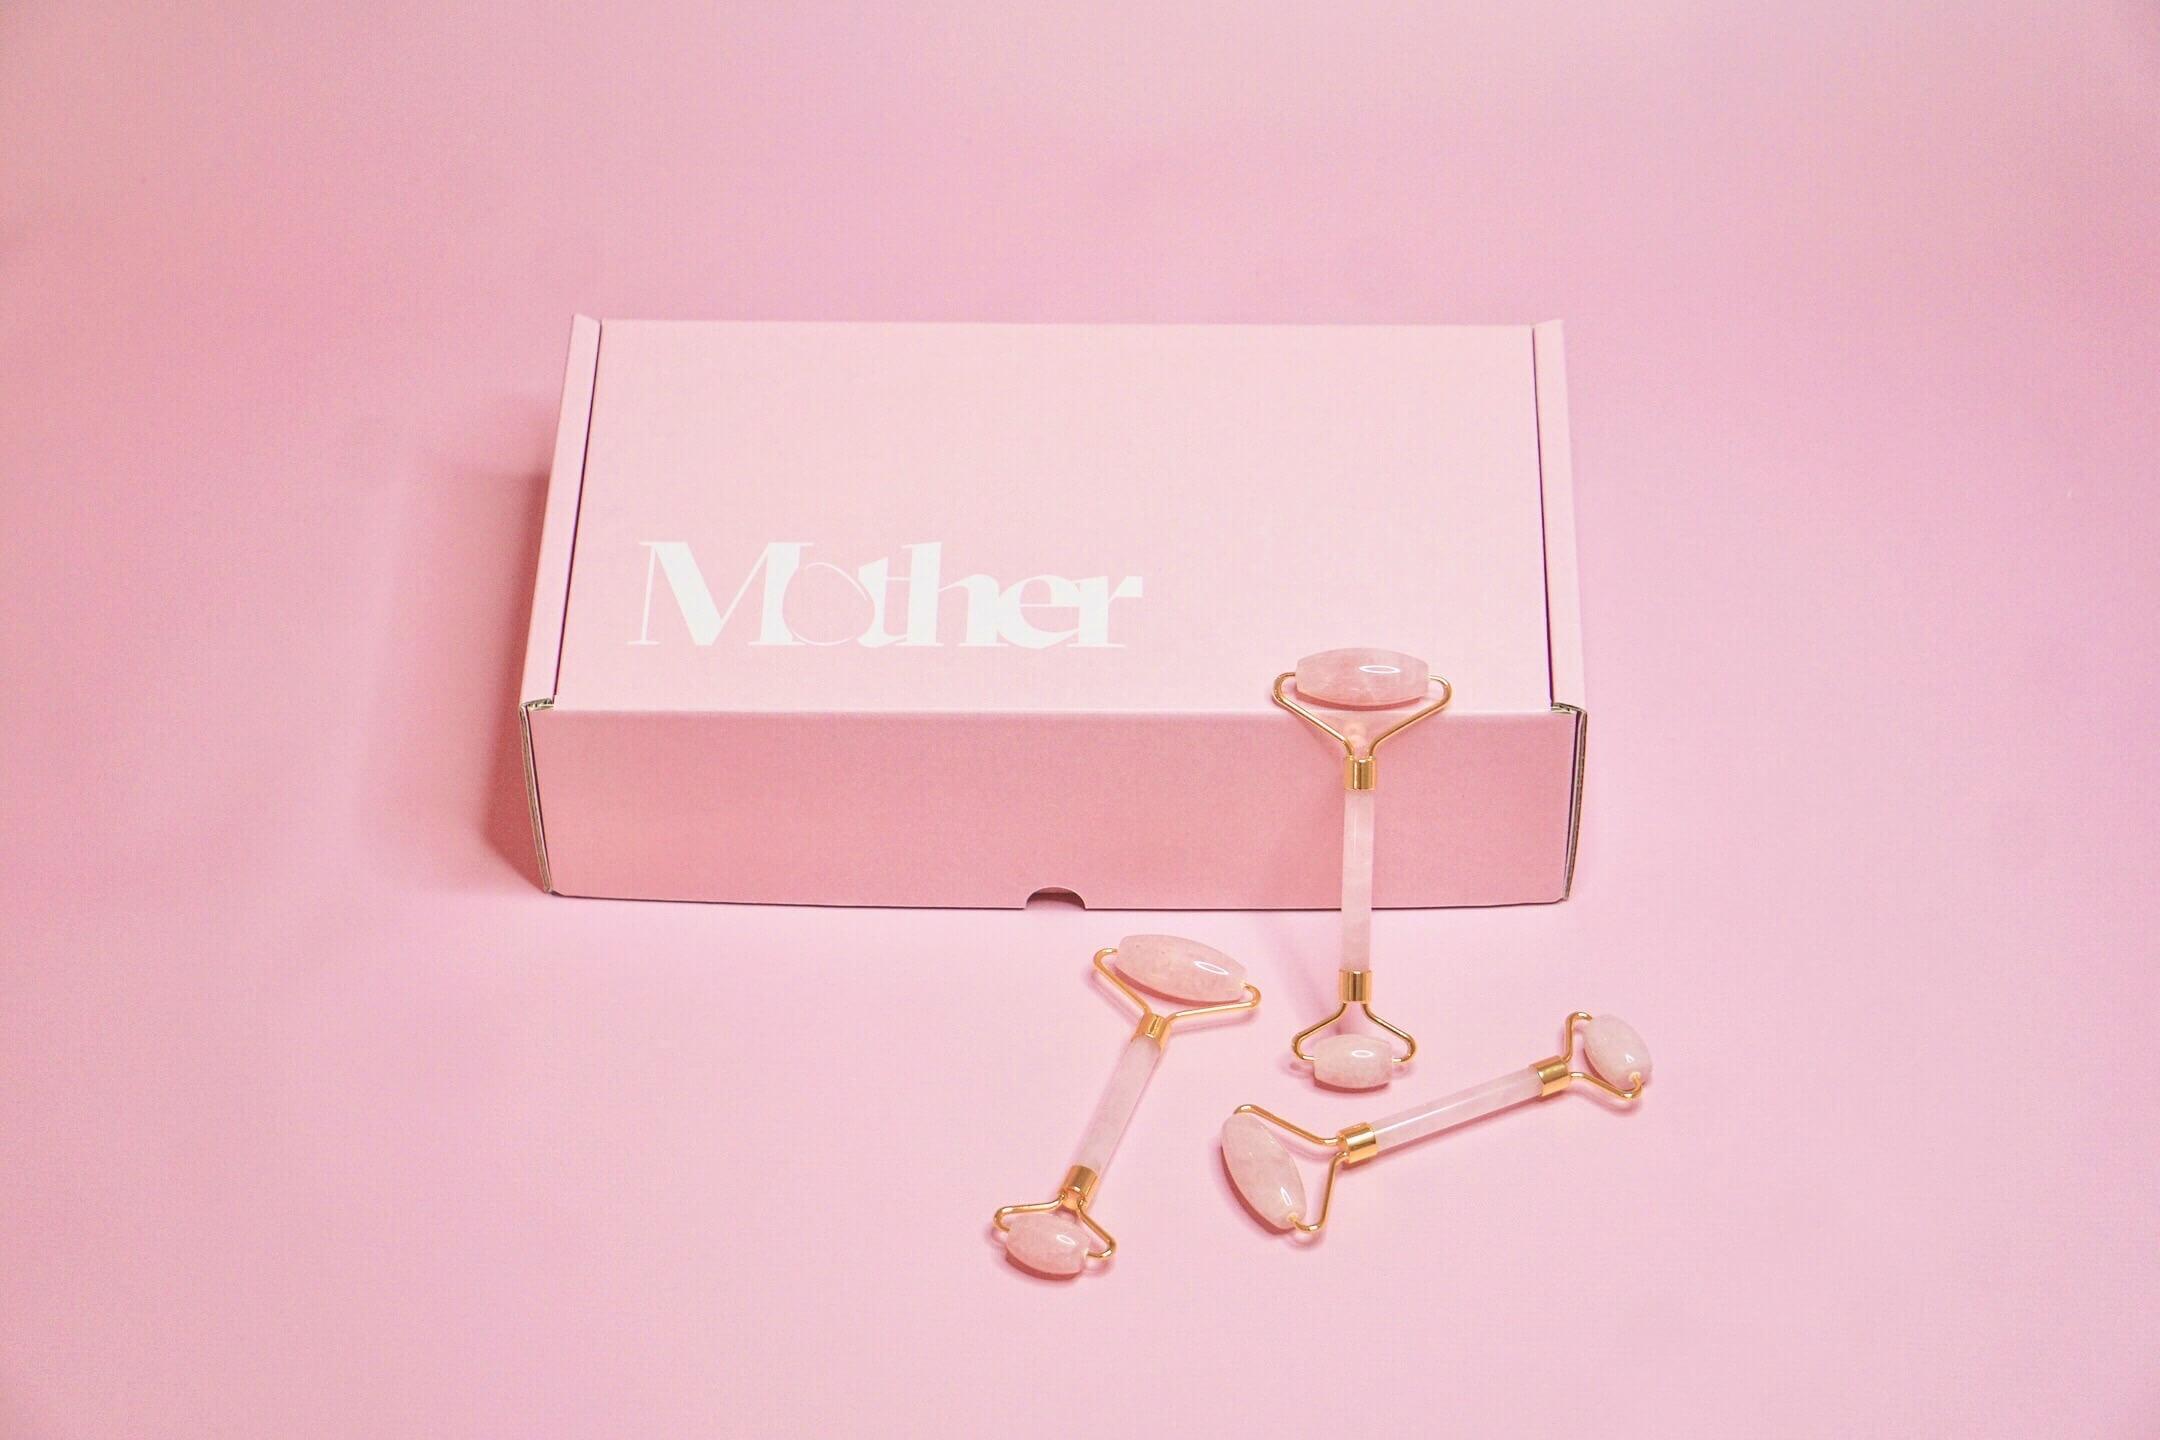 caja personalizada de la marca M0ther